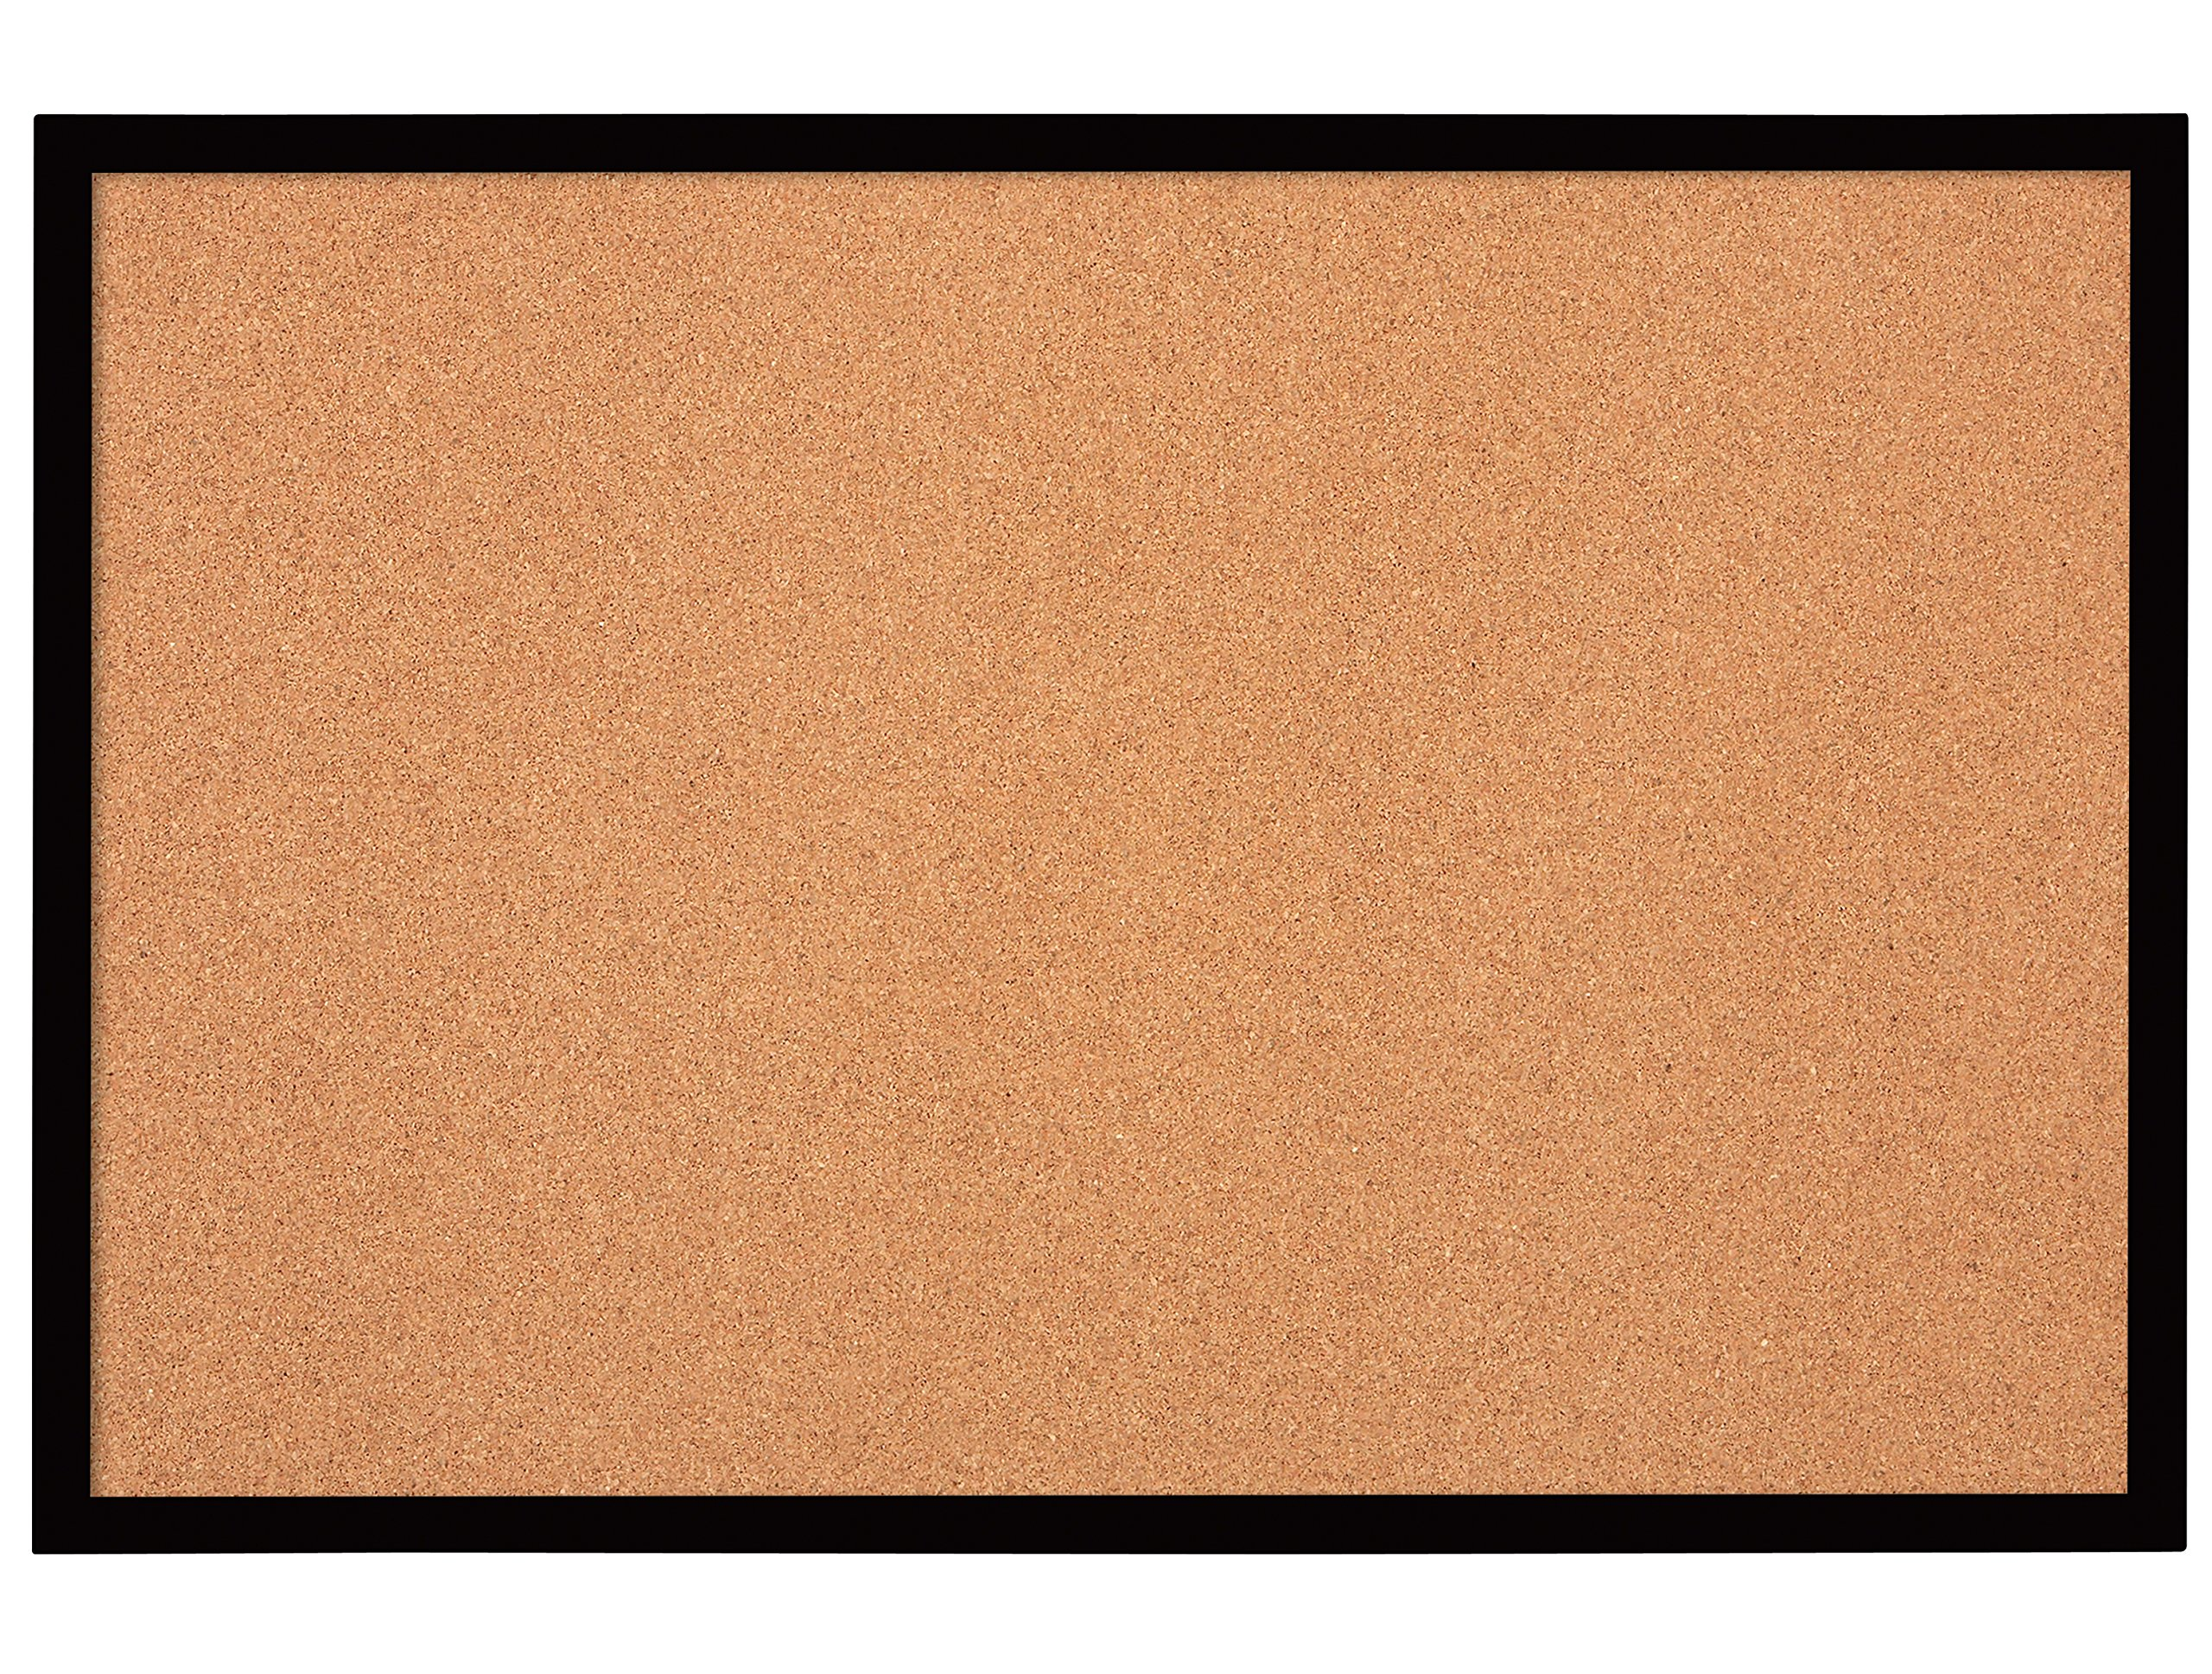 Quartet Bulletin Board, Cork Board, 2' x 3', Black Frame (MWDB2436-BK)